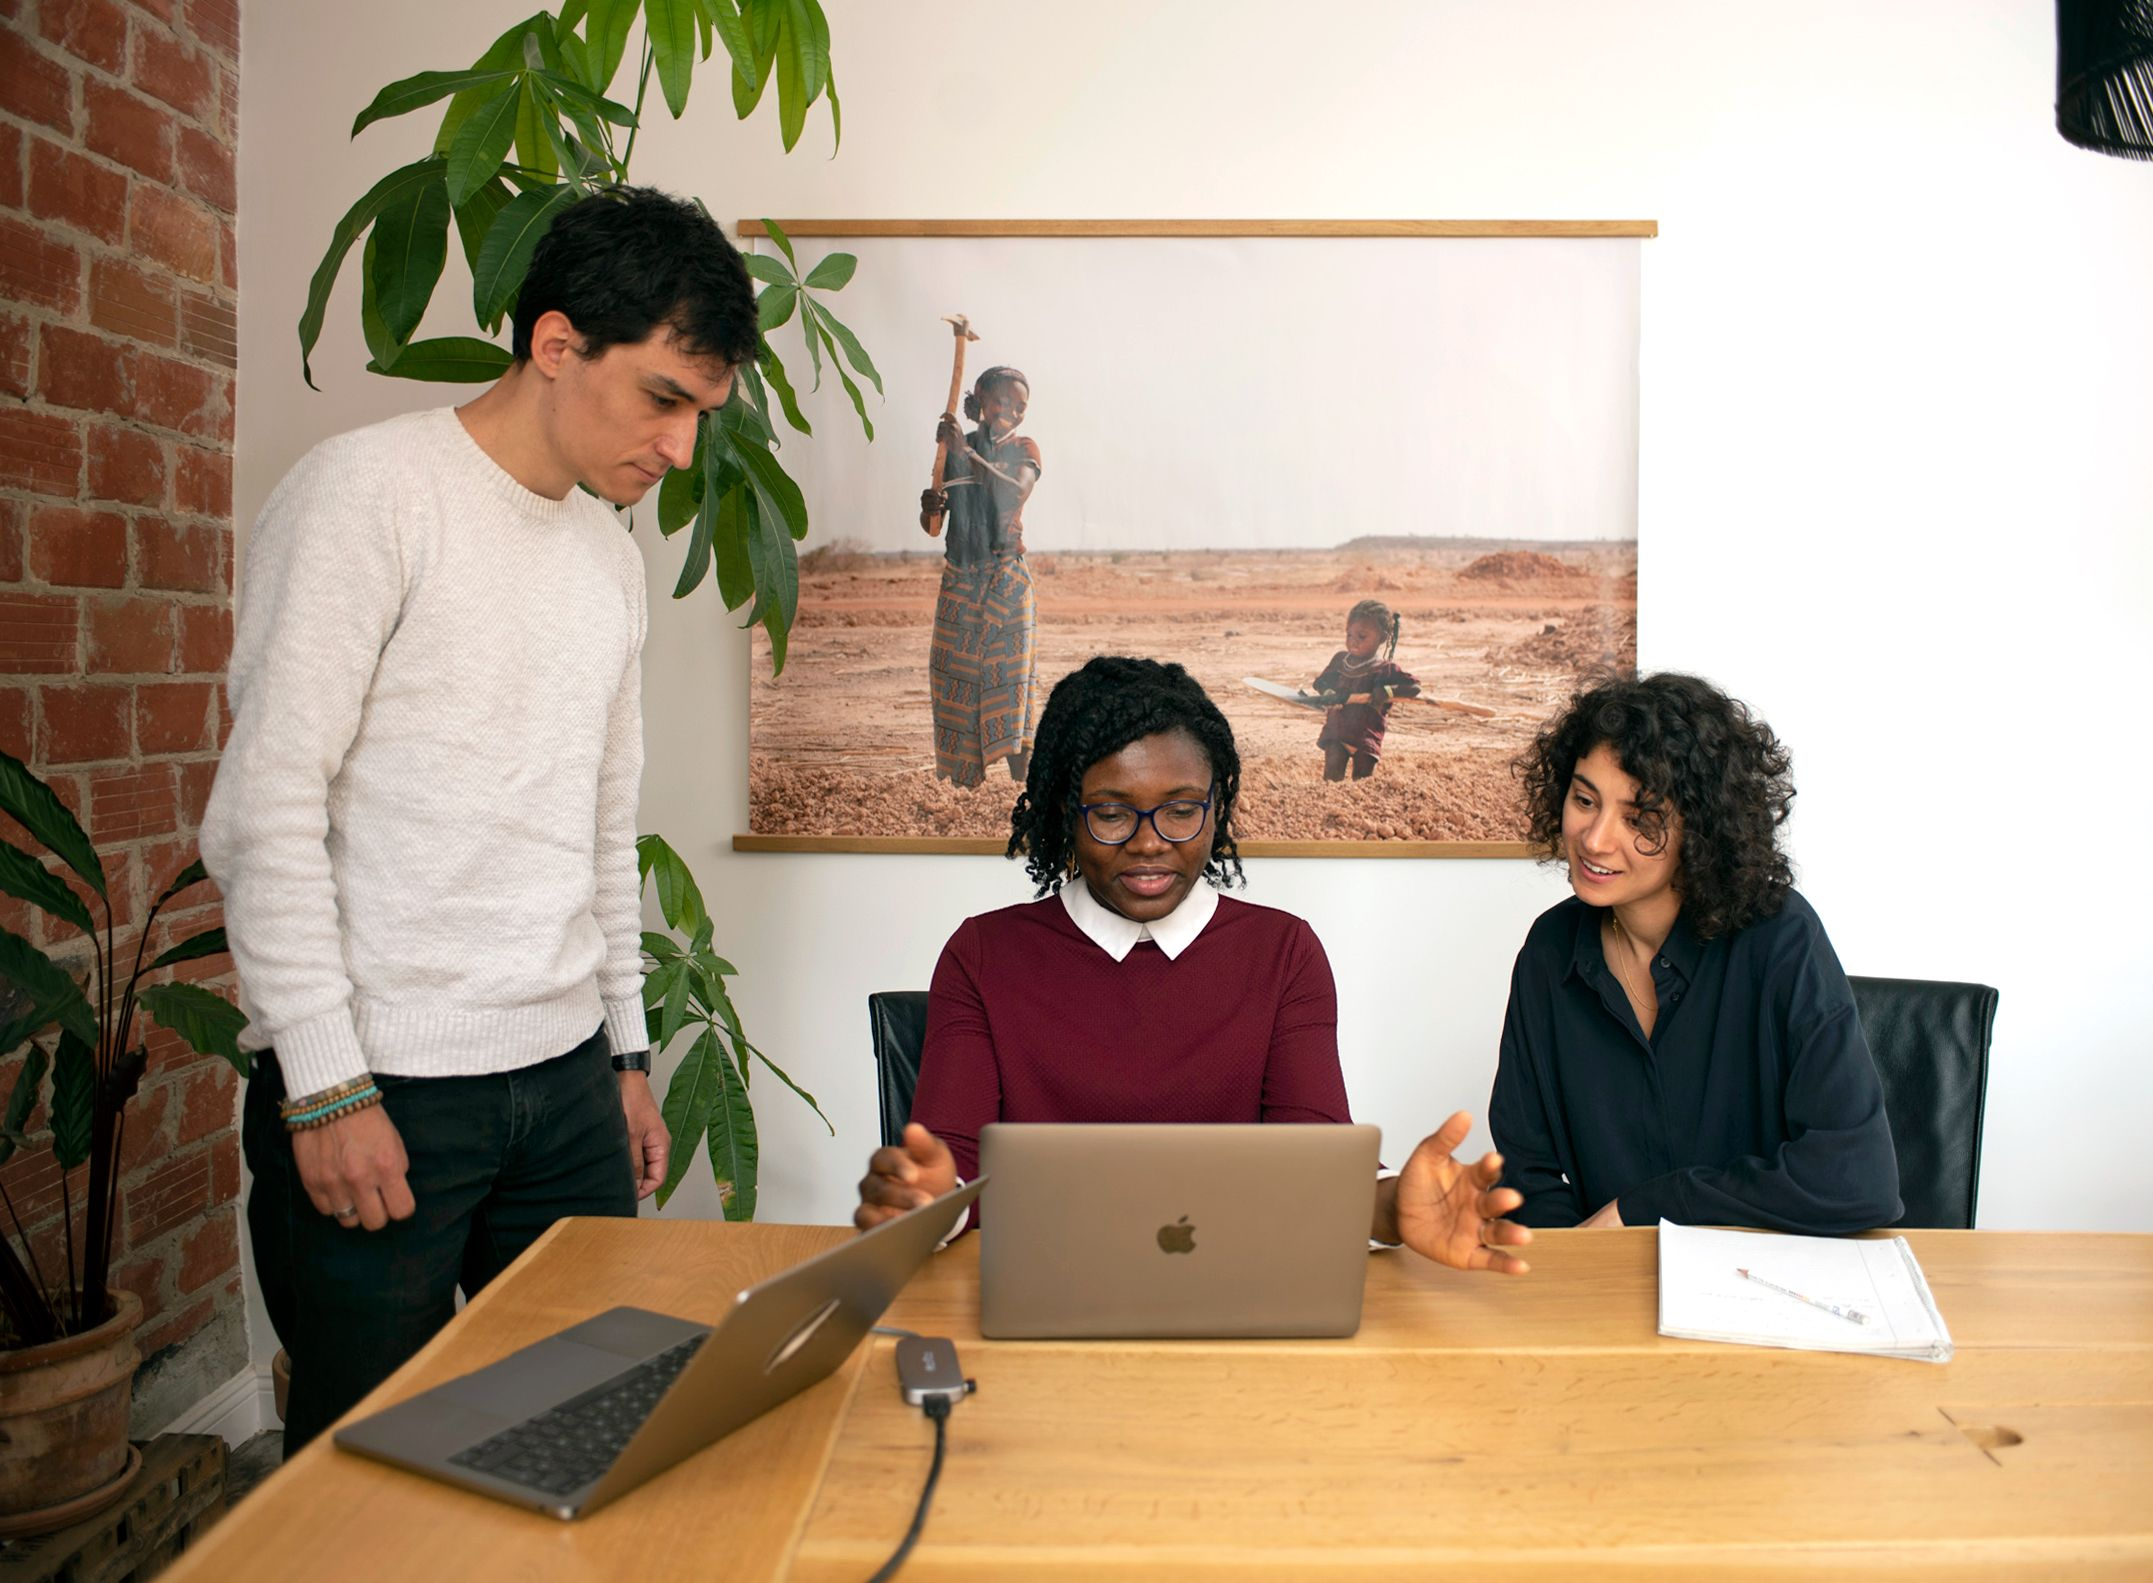 3 diverse colleagues discuss at a laptop